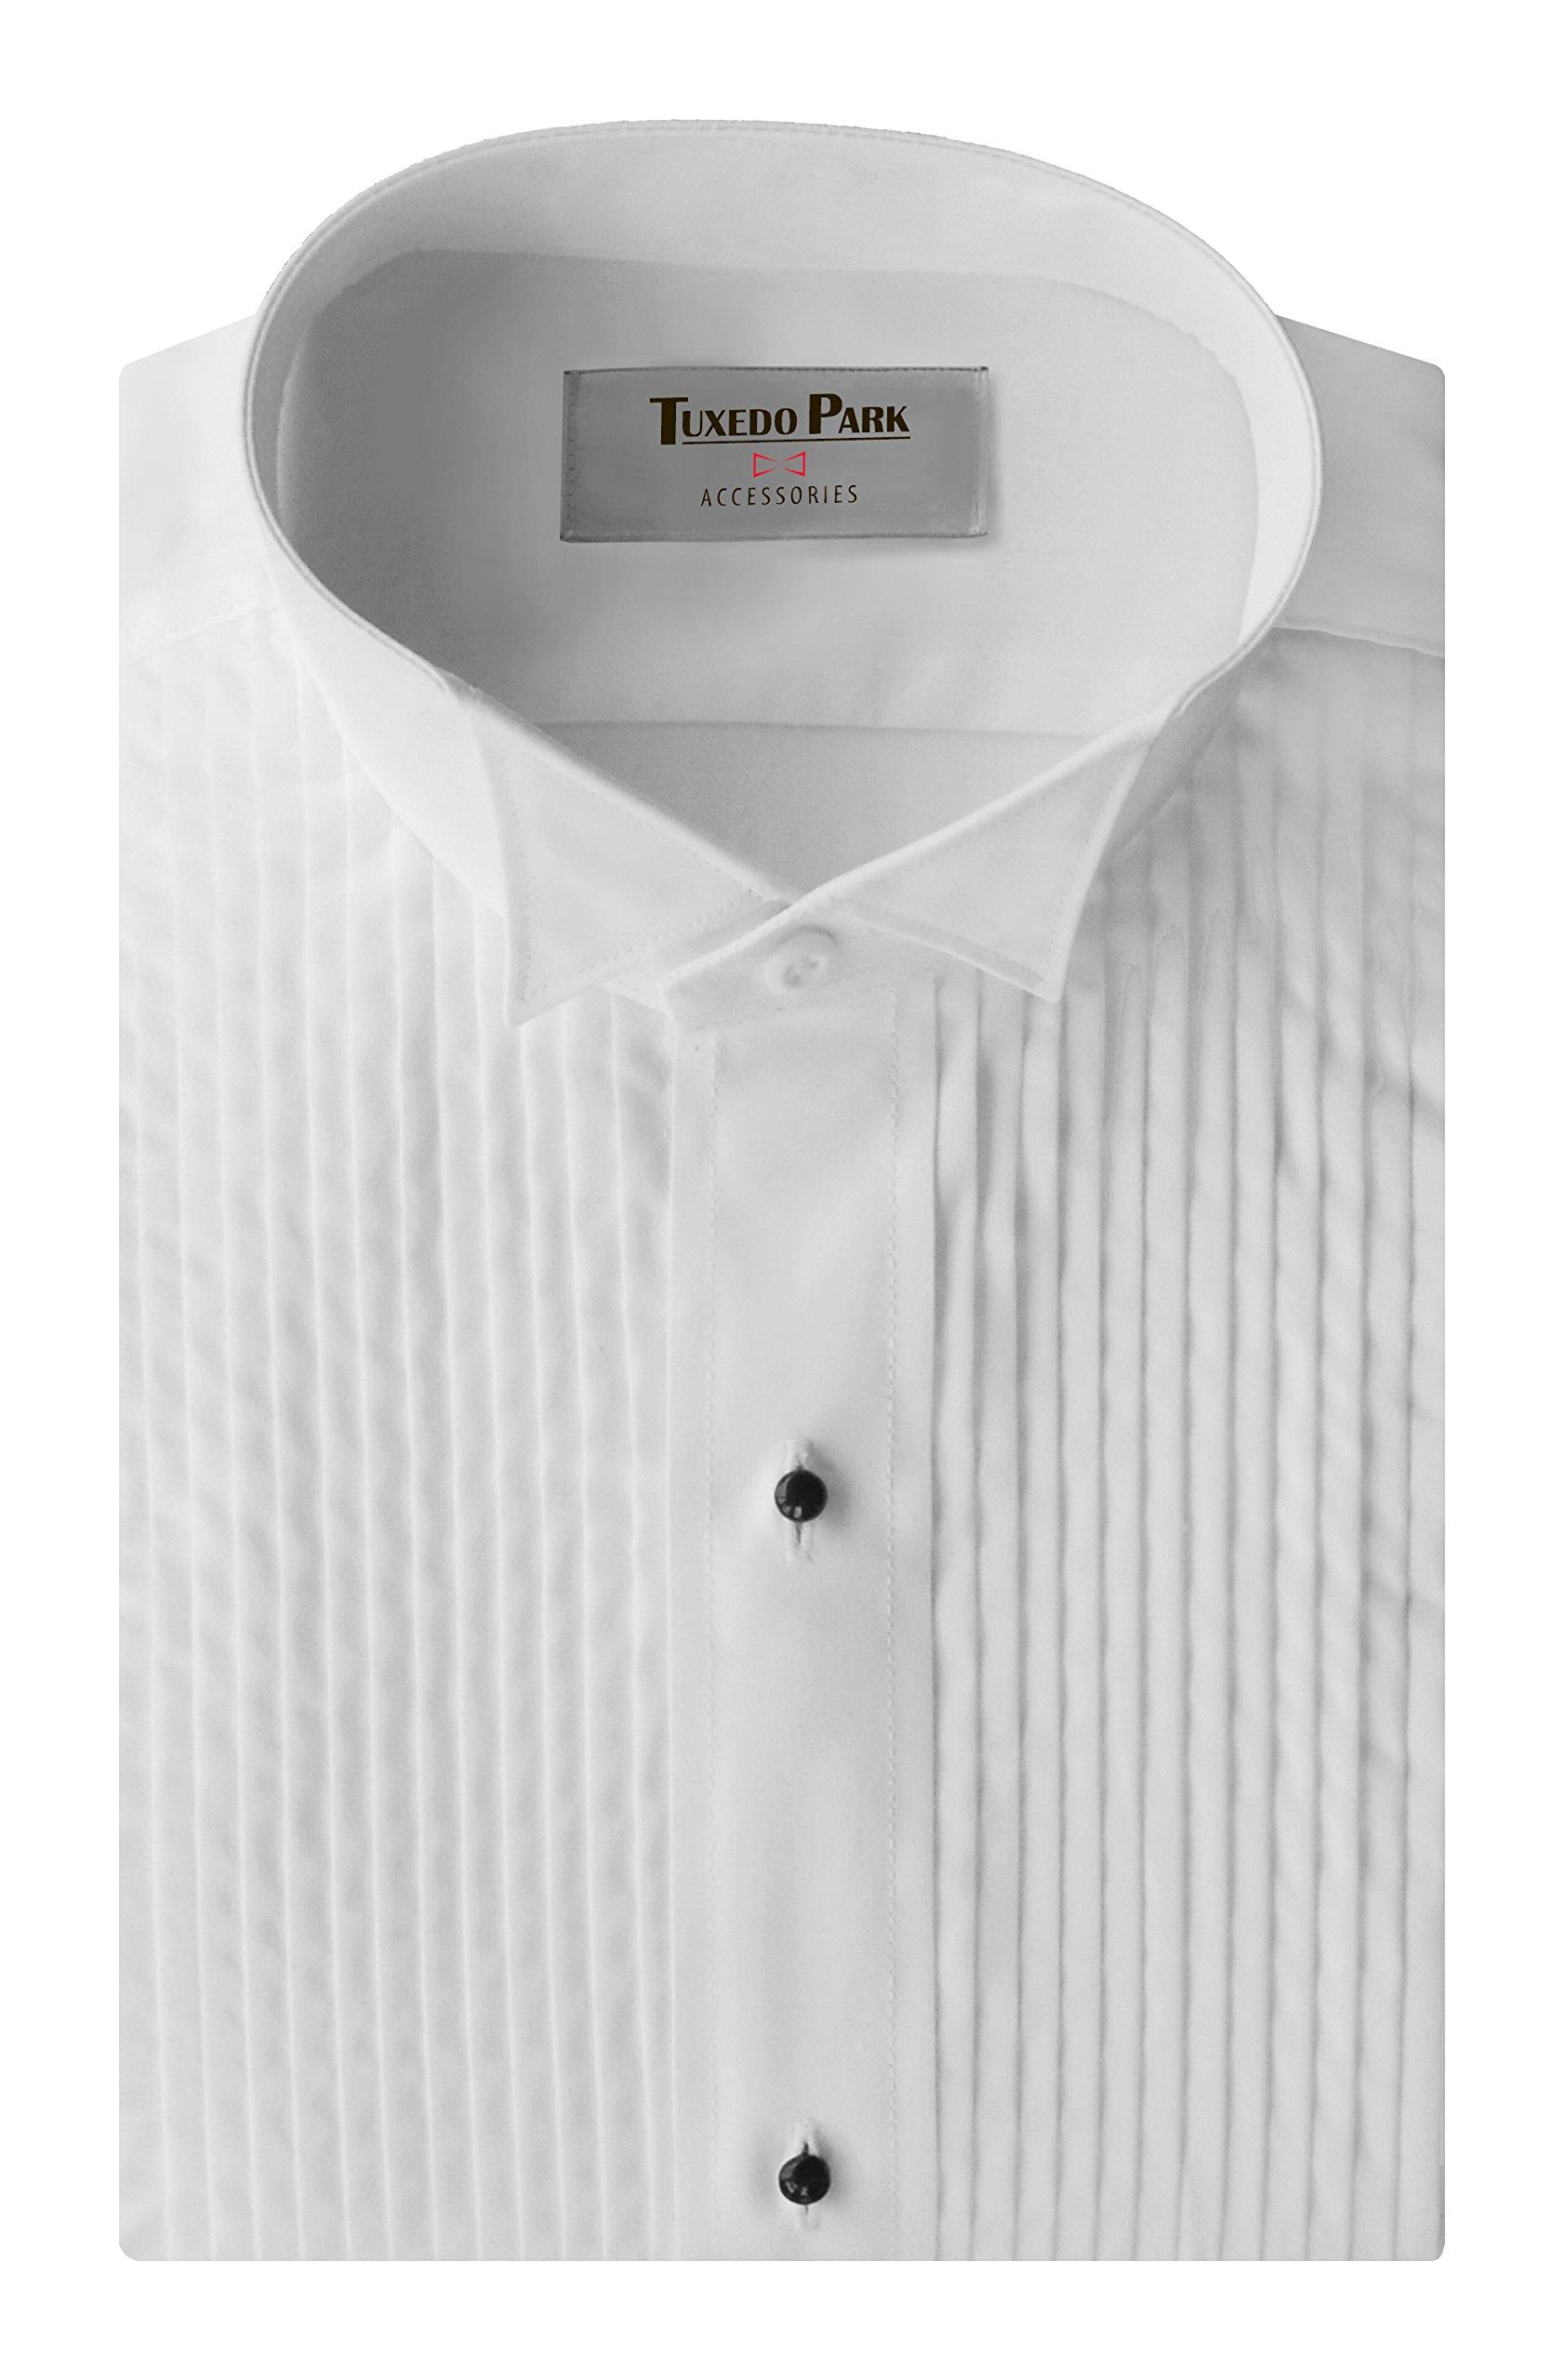 Tuxedo Shirt- White Wing Collar 1/4'' Pleat,2XL/18-18.5'' Neck 32-33'' Sleeve by Tuxedo Park